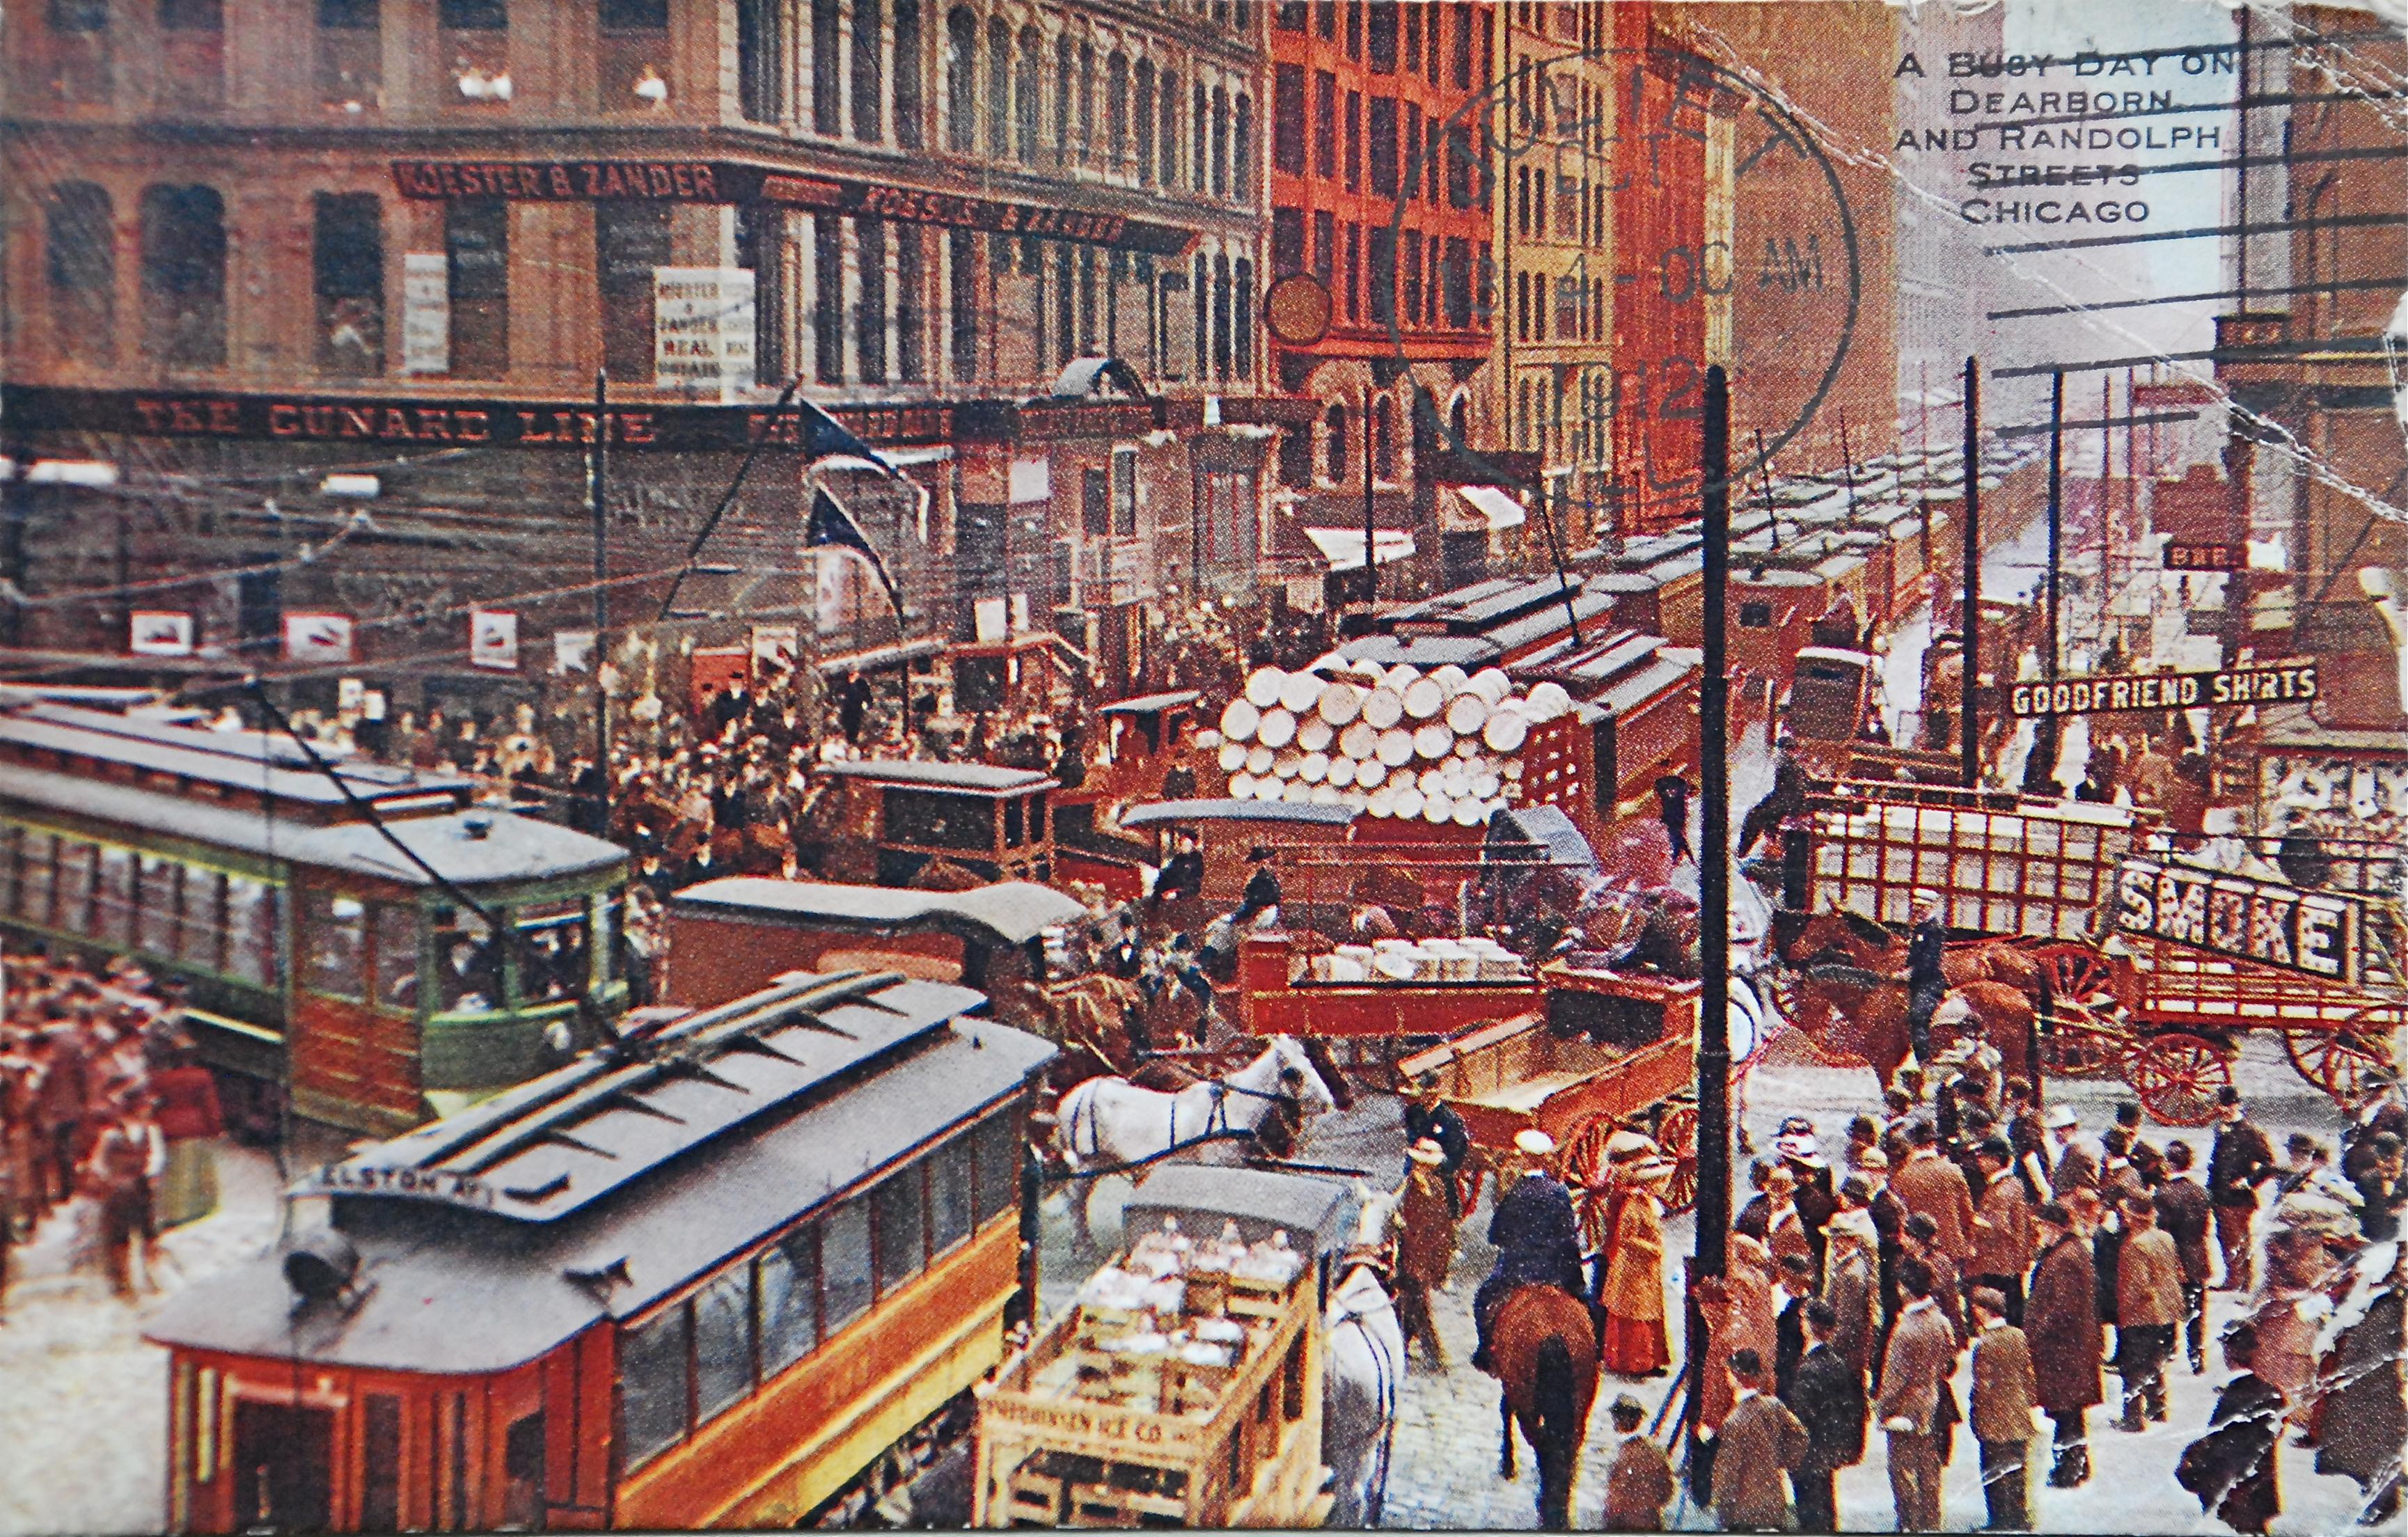 Loop street scene in 1900; colorized photograph